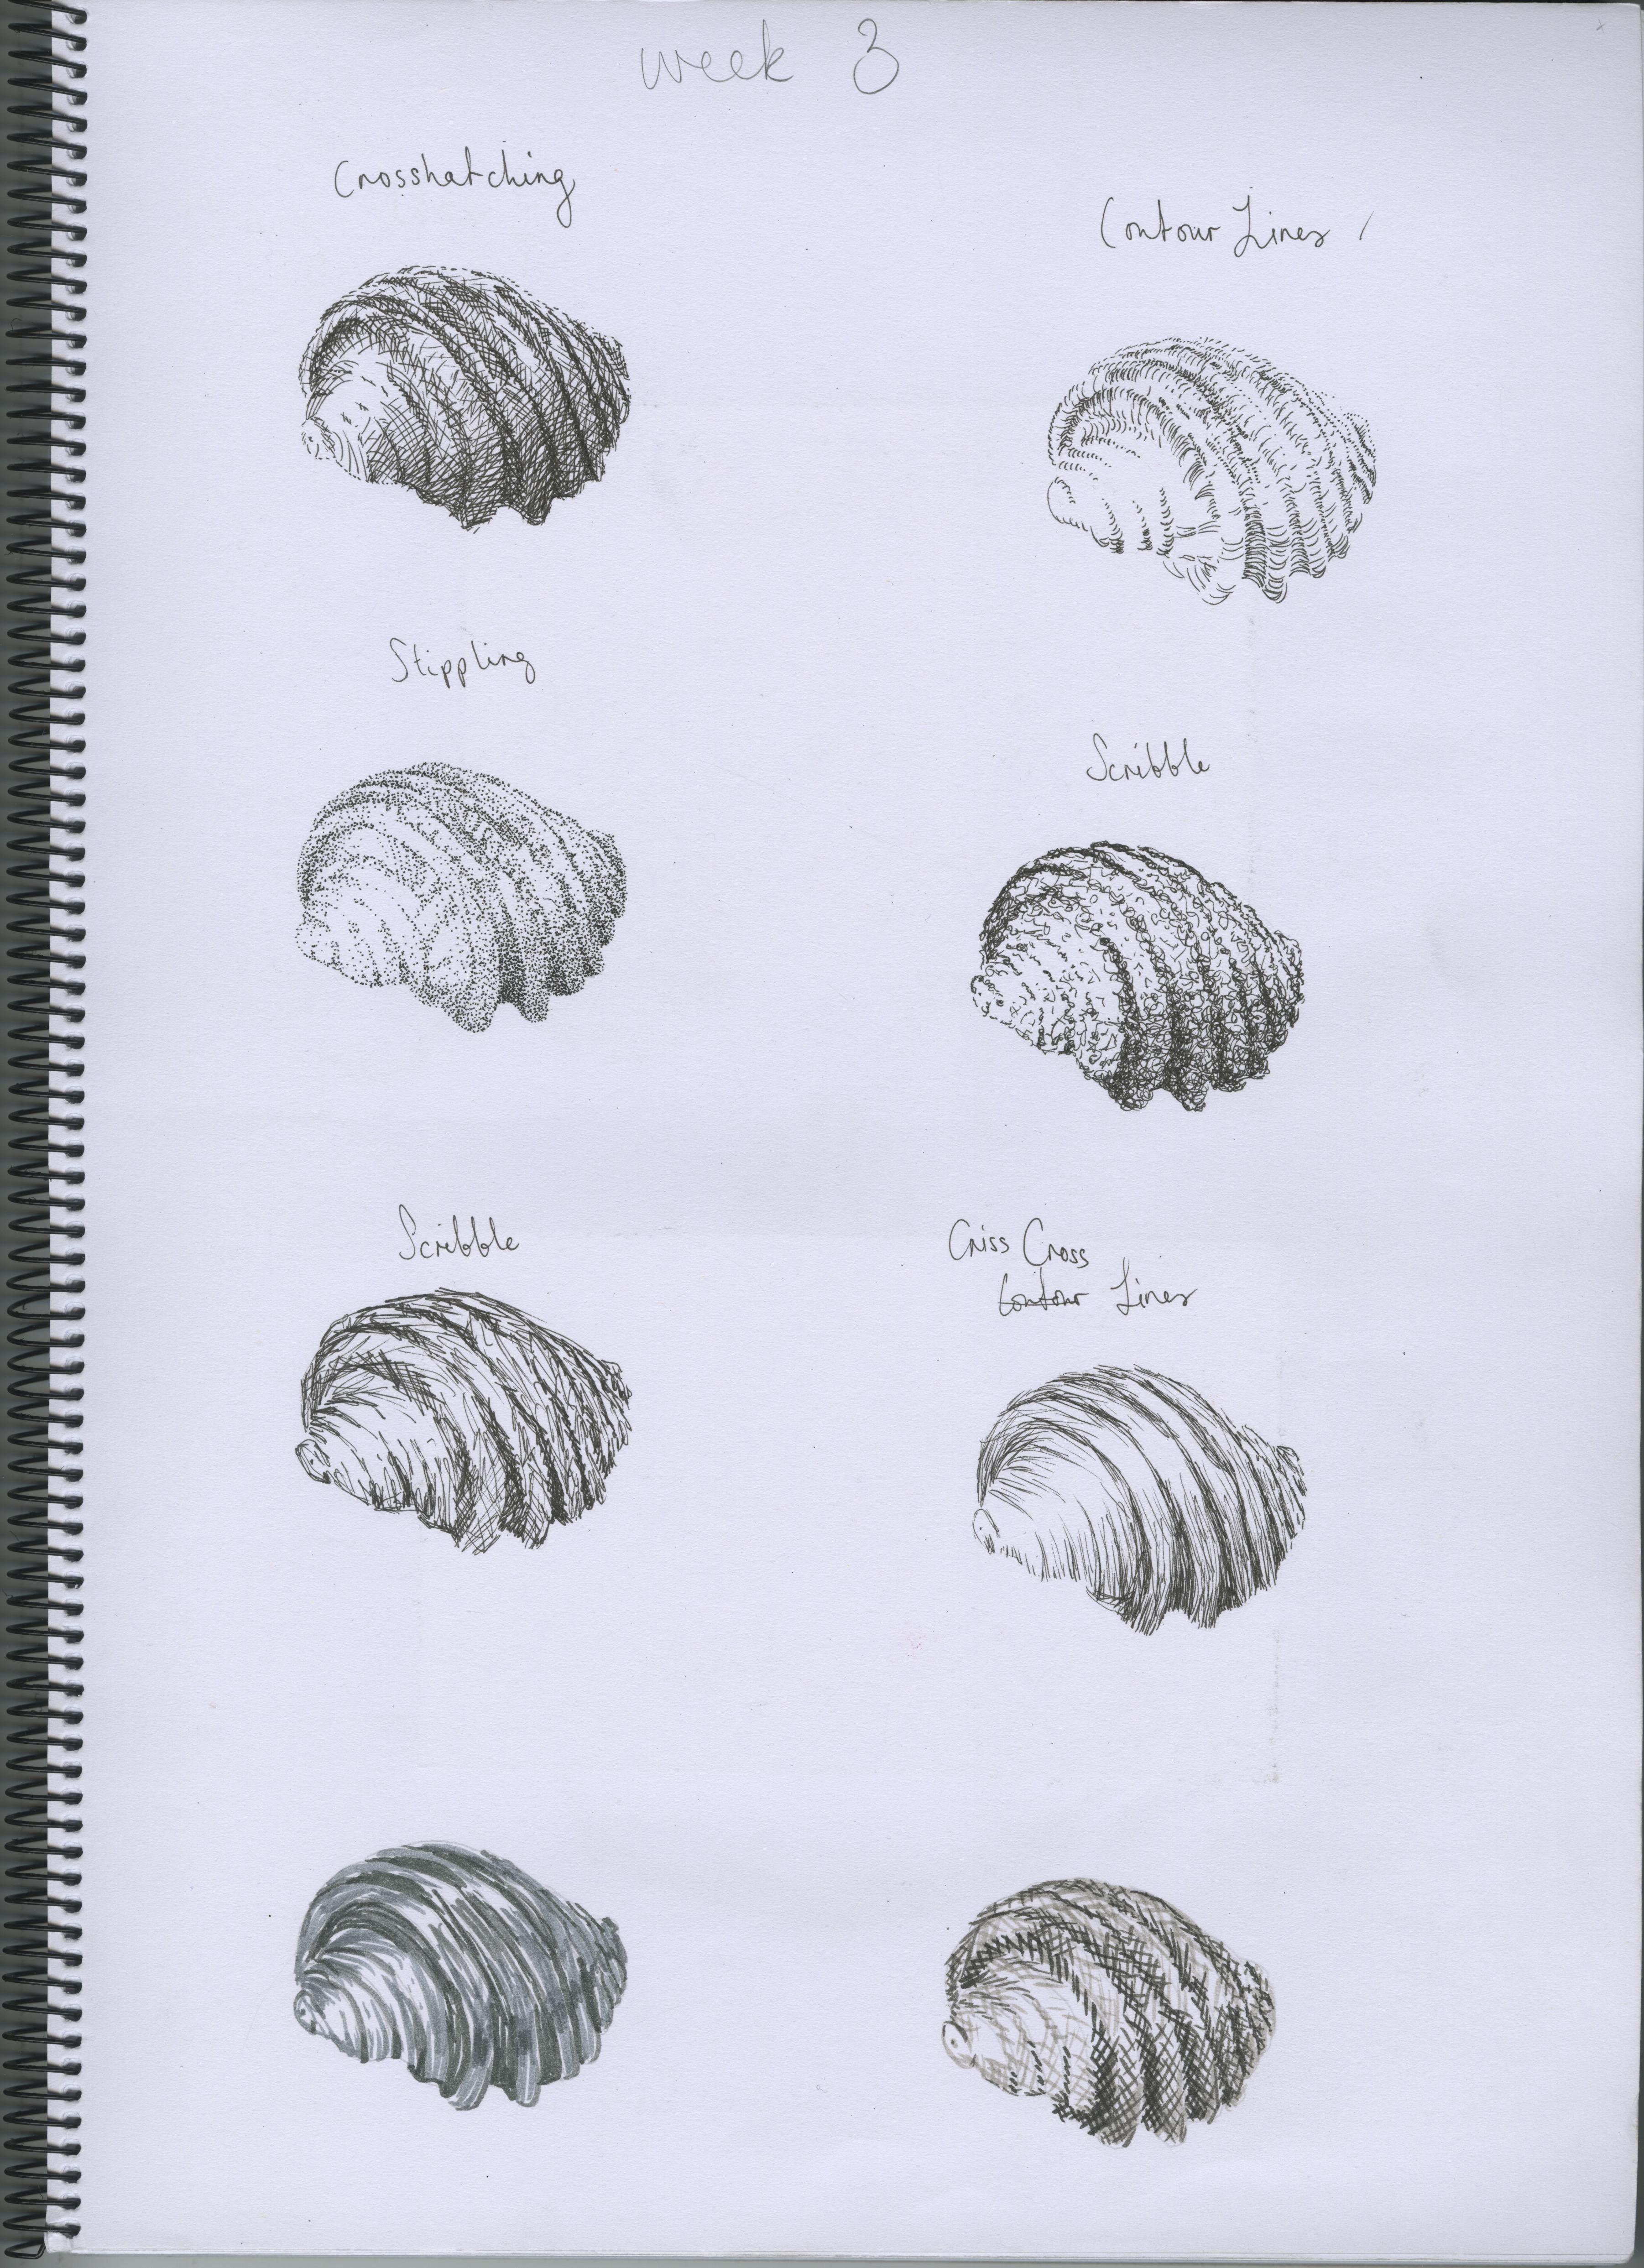 Drawn shell pen drawing 10 drawing artist 2015 14